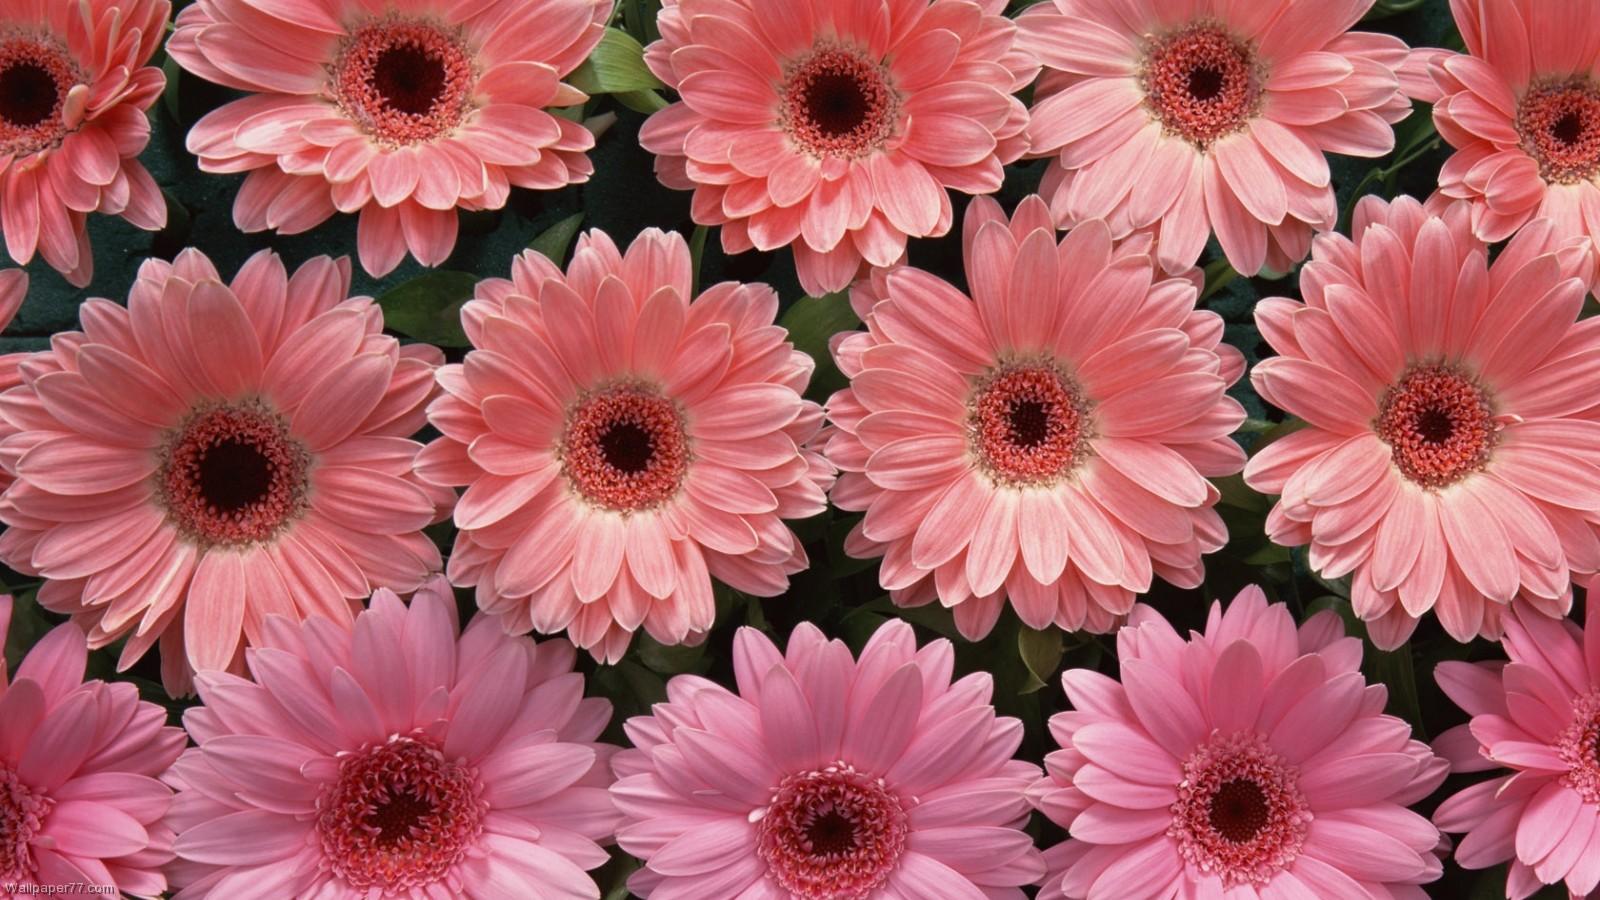 1600x900px Flower Pink Wallpaper Wallpapersafari